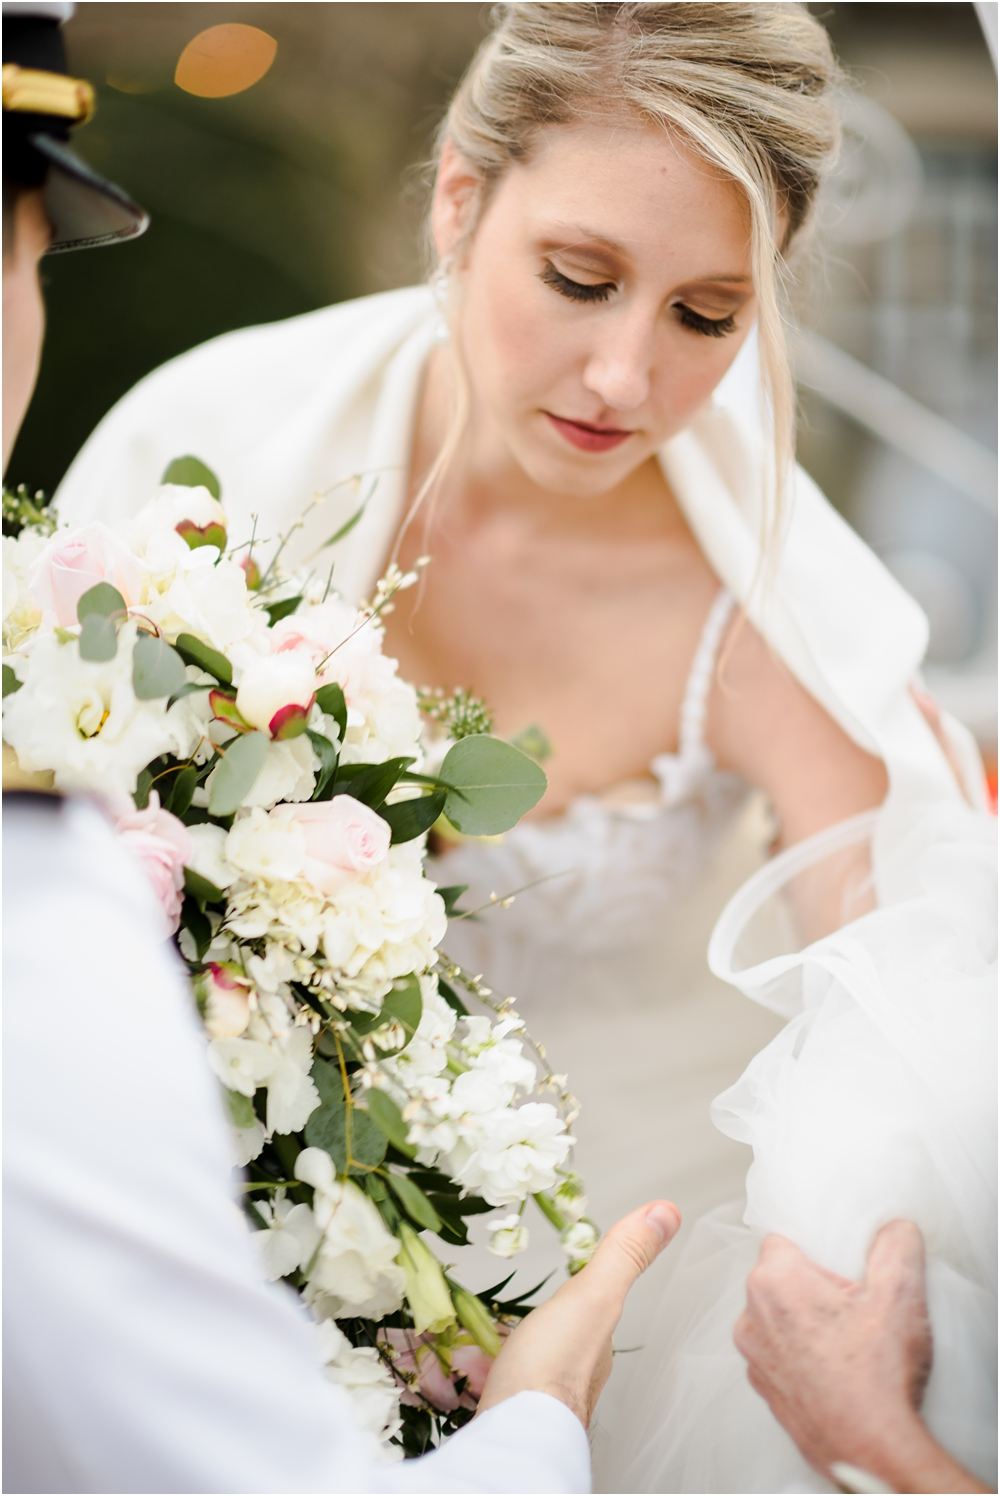 oconnor-pensacola-florida-wedding-photographer-kiersten-taylor-66.jpg